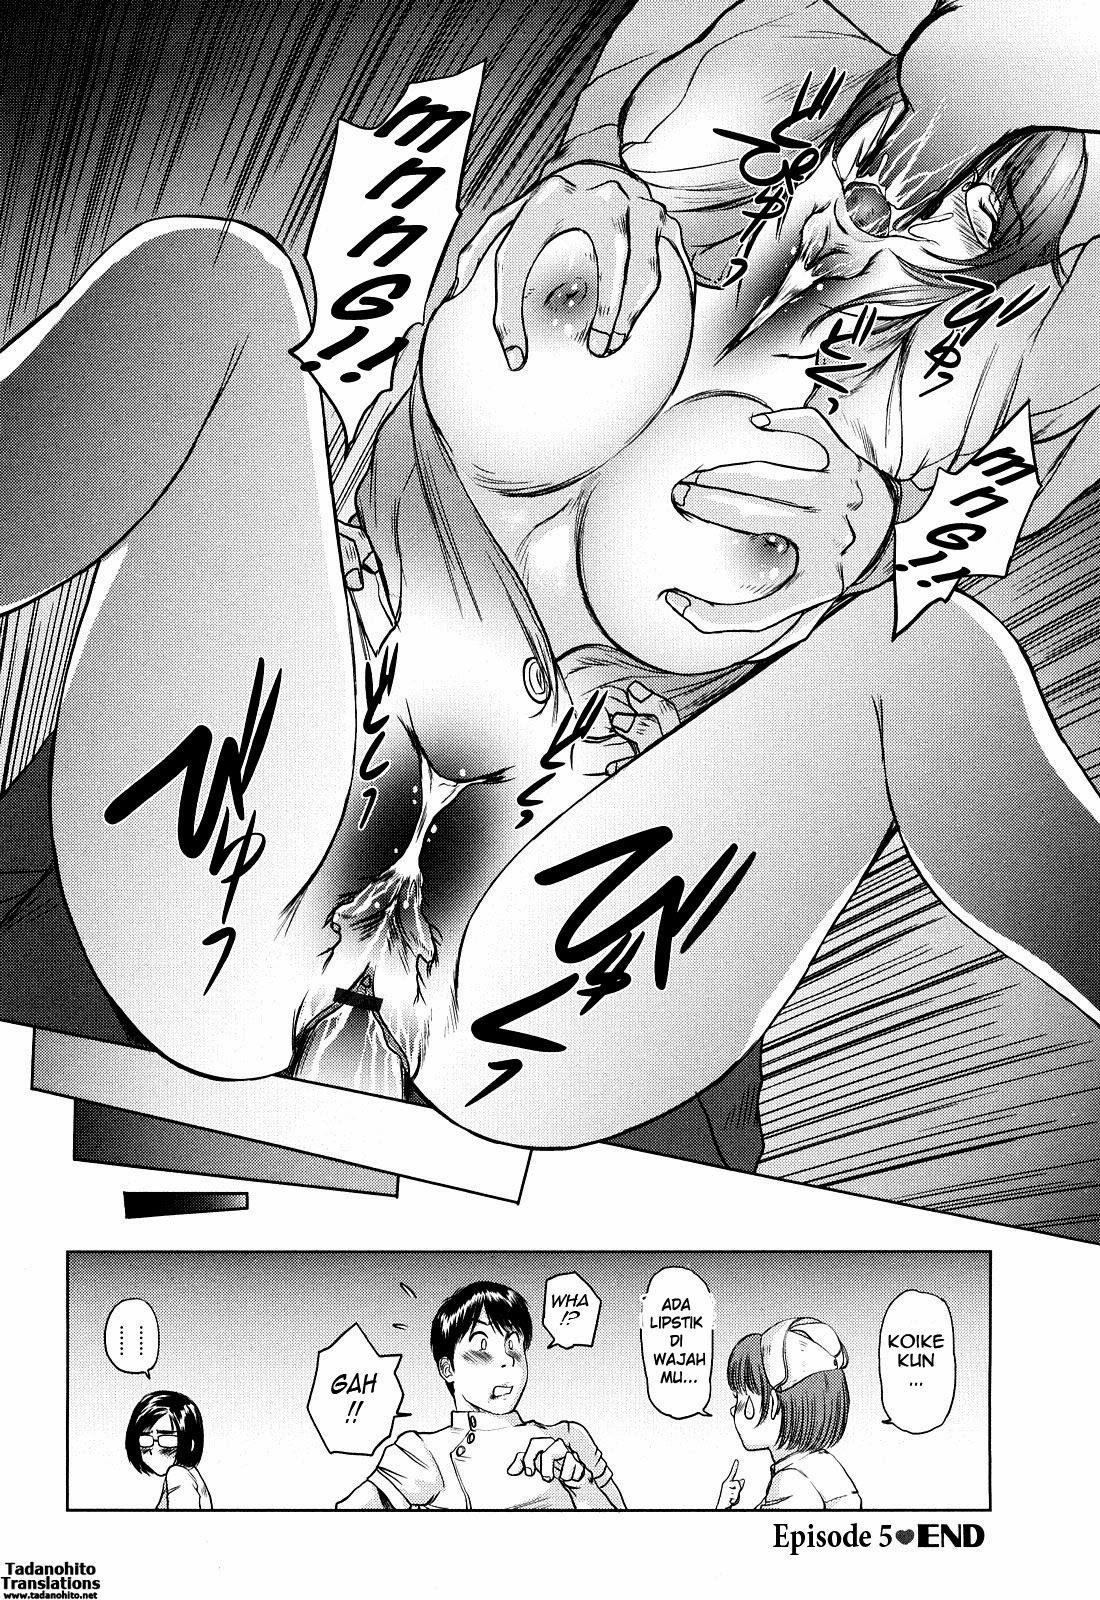 Komik Hentai Suster Semok bikin sange 2 Pasien Manga Sex Porn Doujin XXX Bokep 18